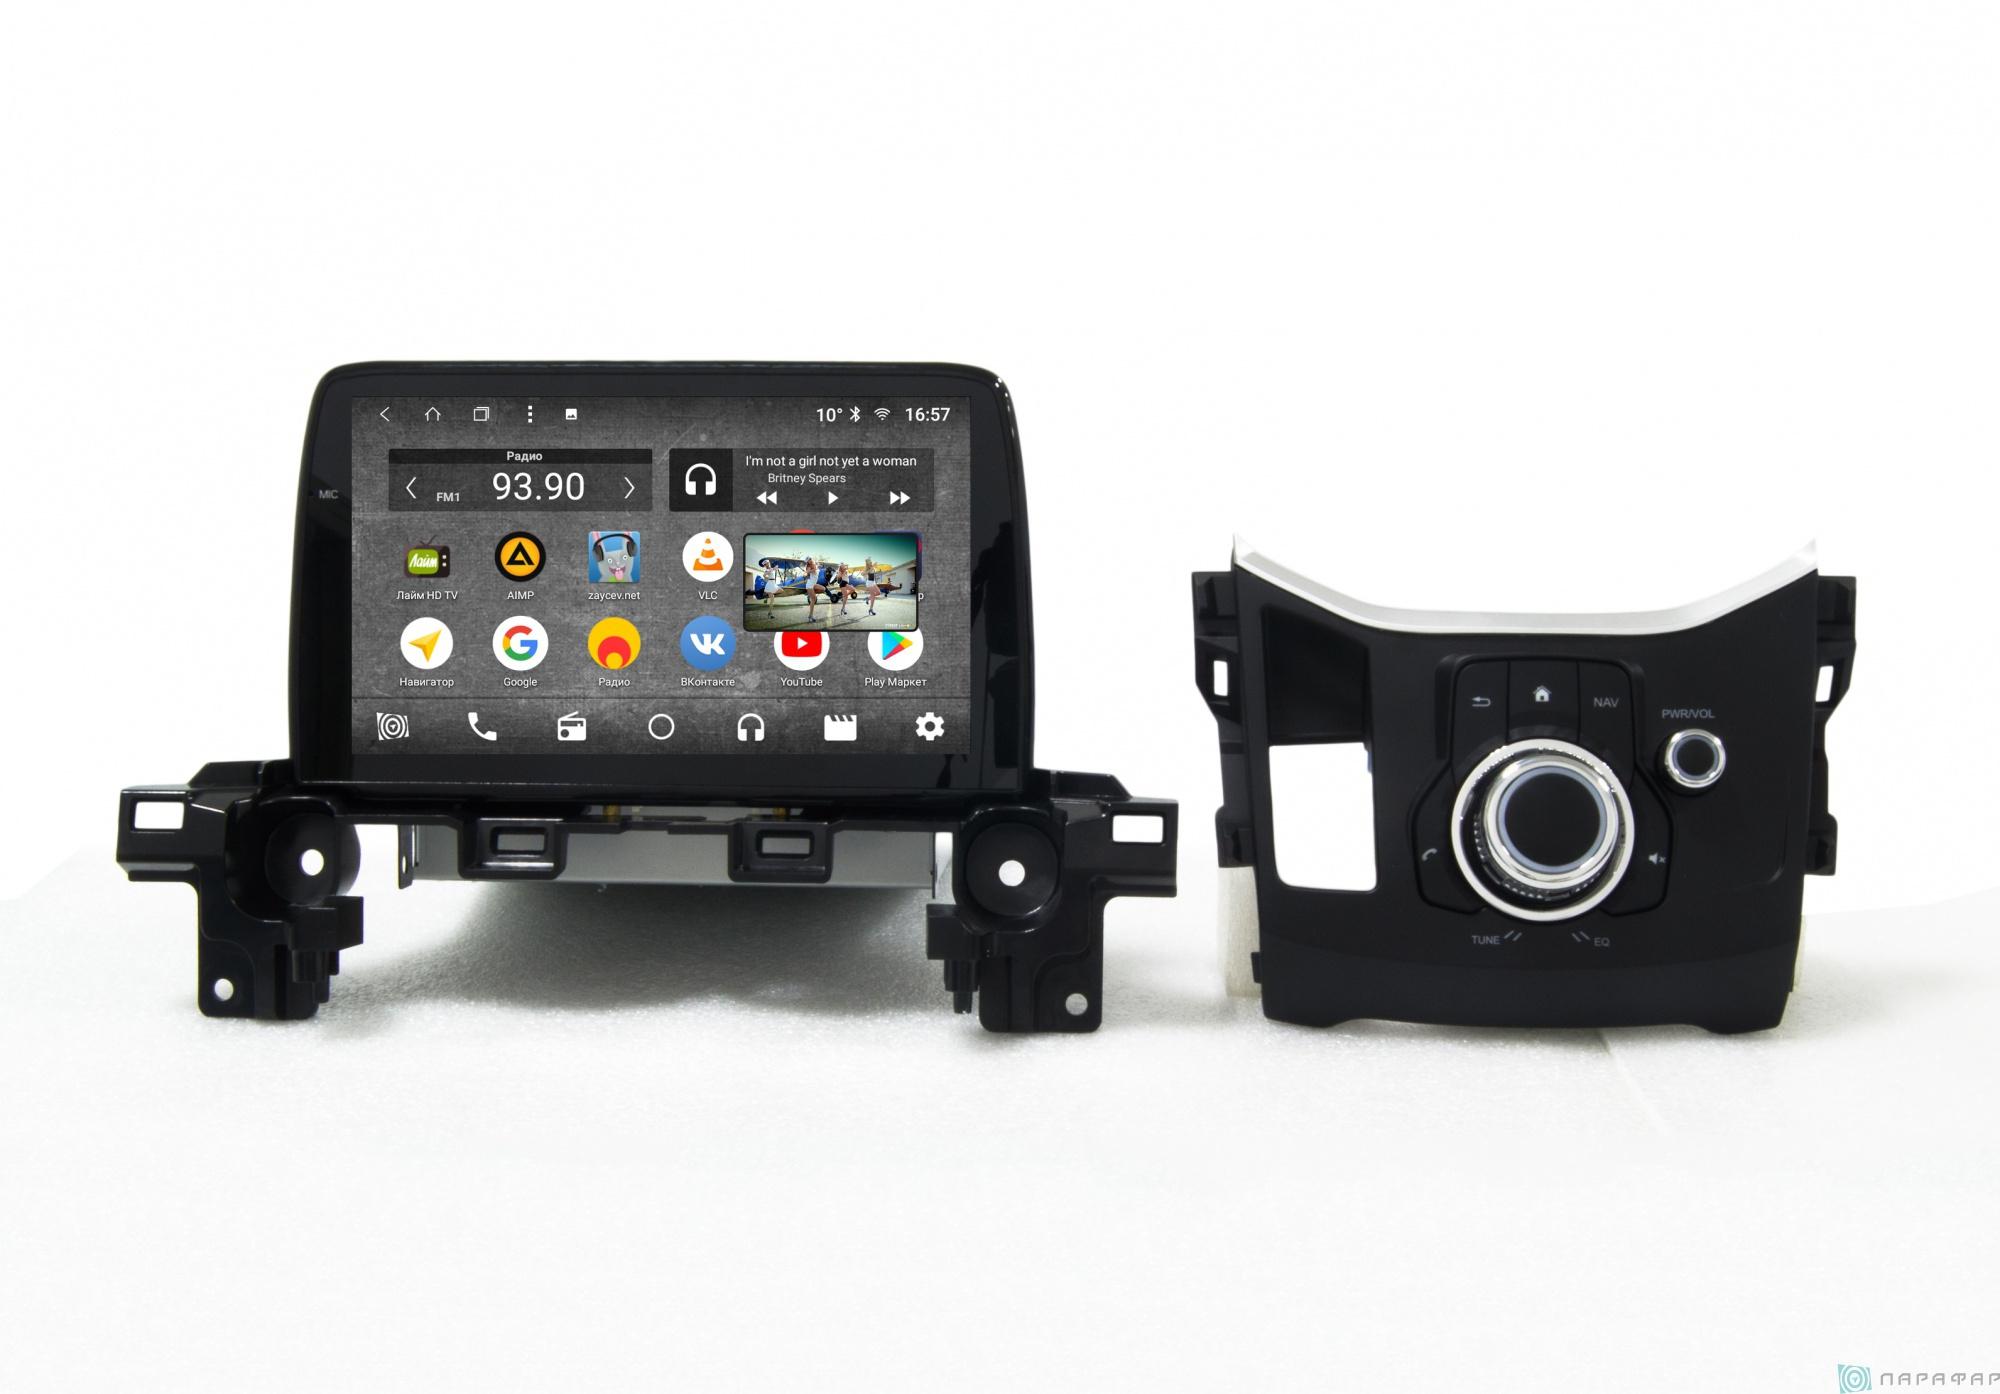 Штатная магнитола Parafar с IPS матрицей для Mazda CX-5 на Android 7.1.2 (PF981K) bluboo picasso 5 0inch ips hd android 5 1 smartphone black